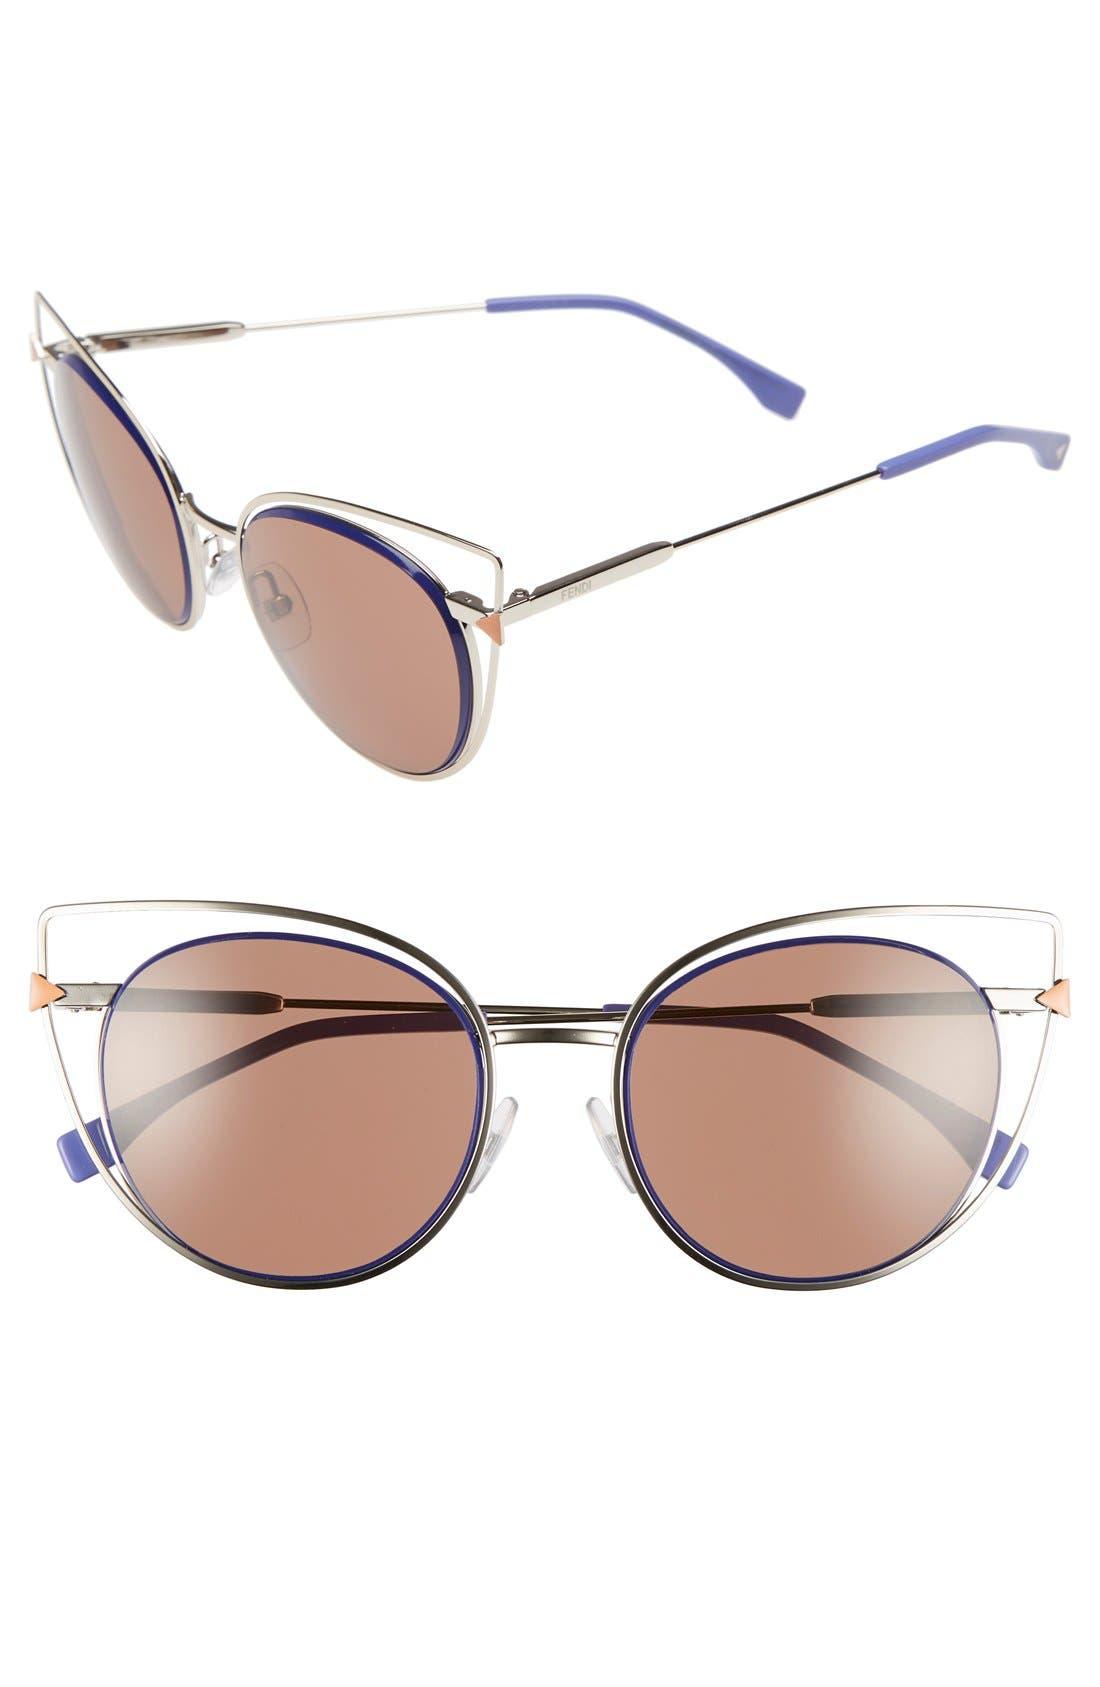 53mm Sunglasses,                             Main thumbnail 4, color,